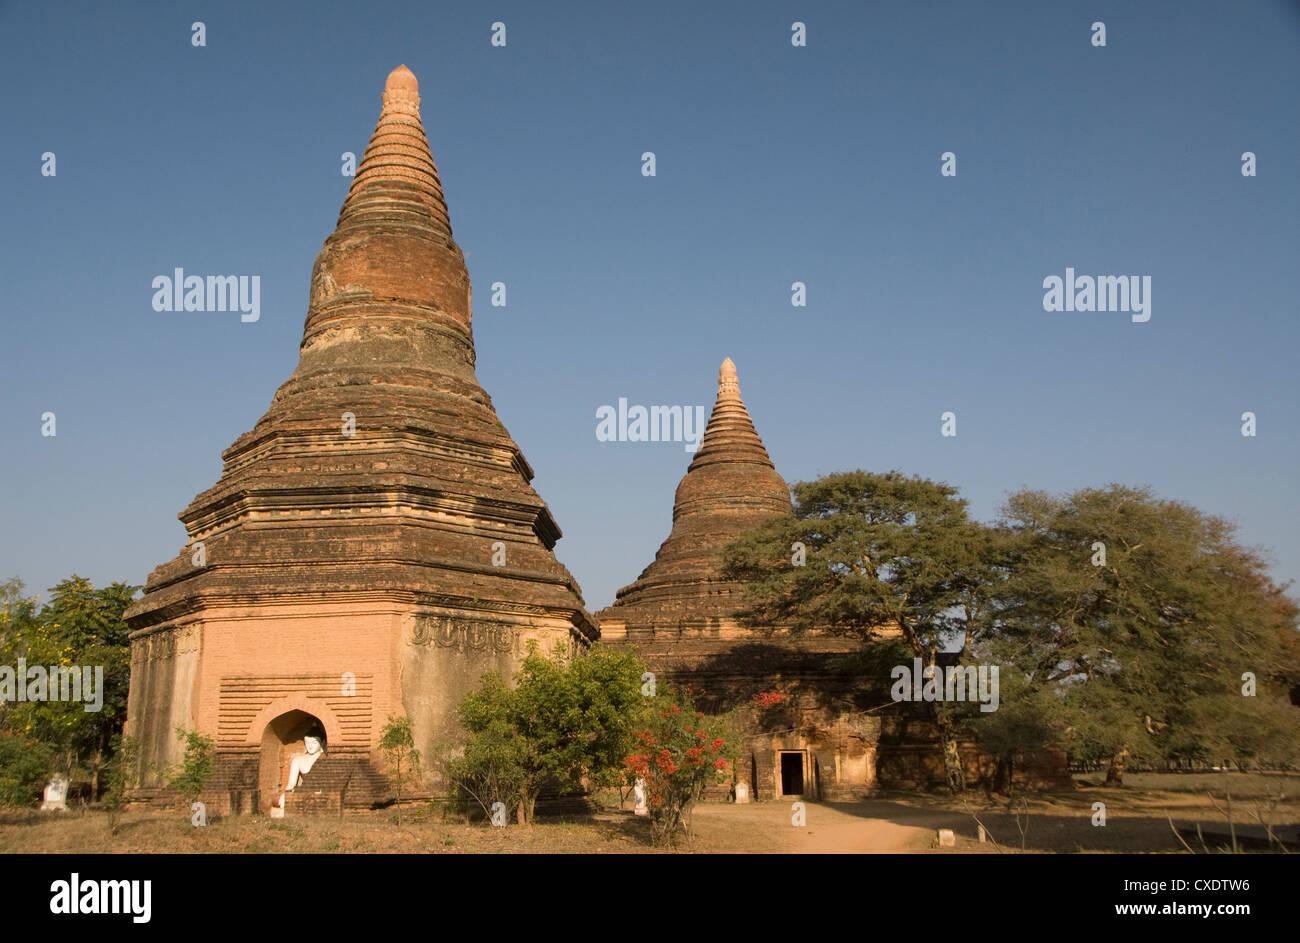 Pequeña paya, Bagan (pagano), Myanmar (Birmania), Asia Foto de stock